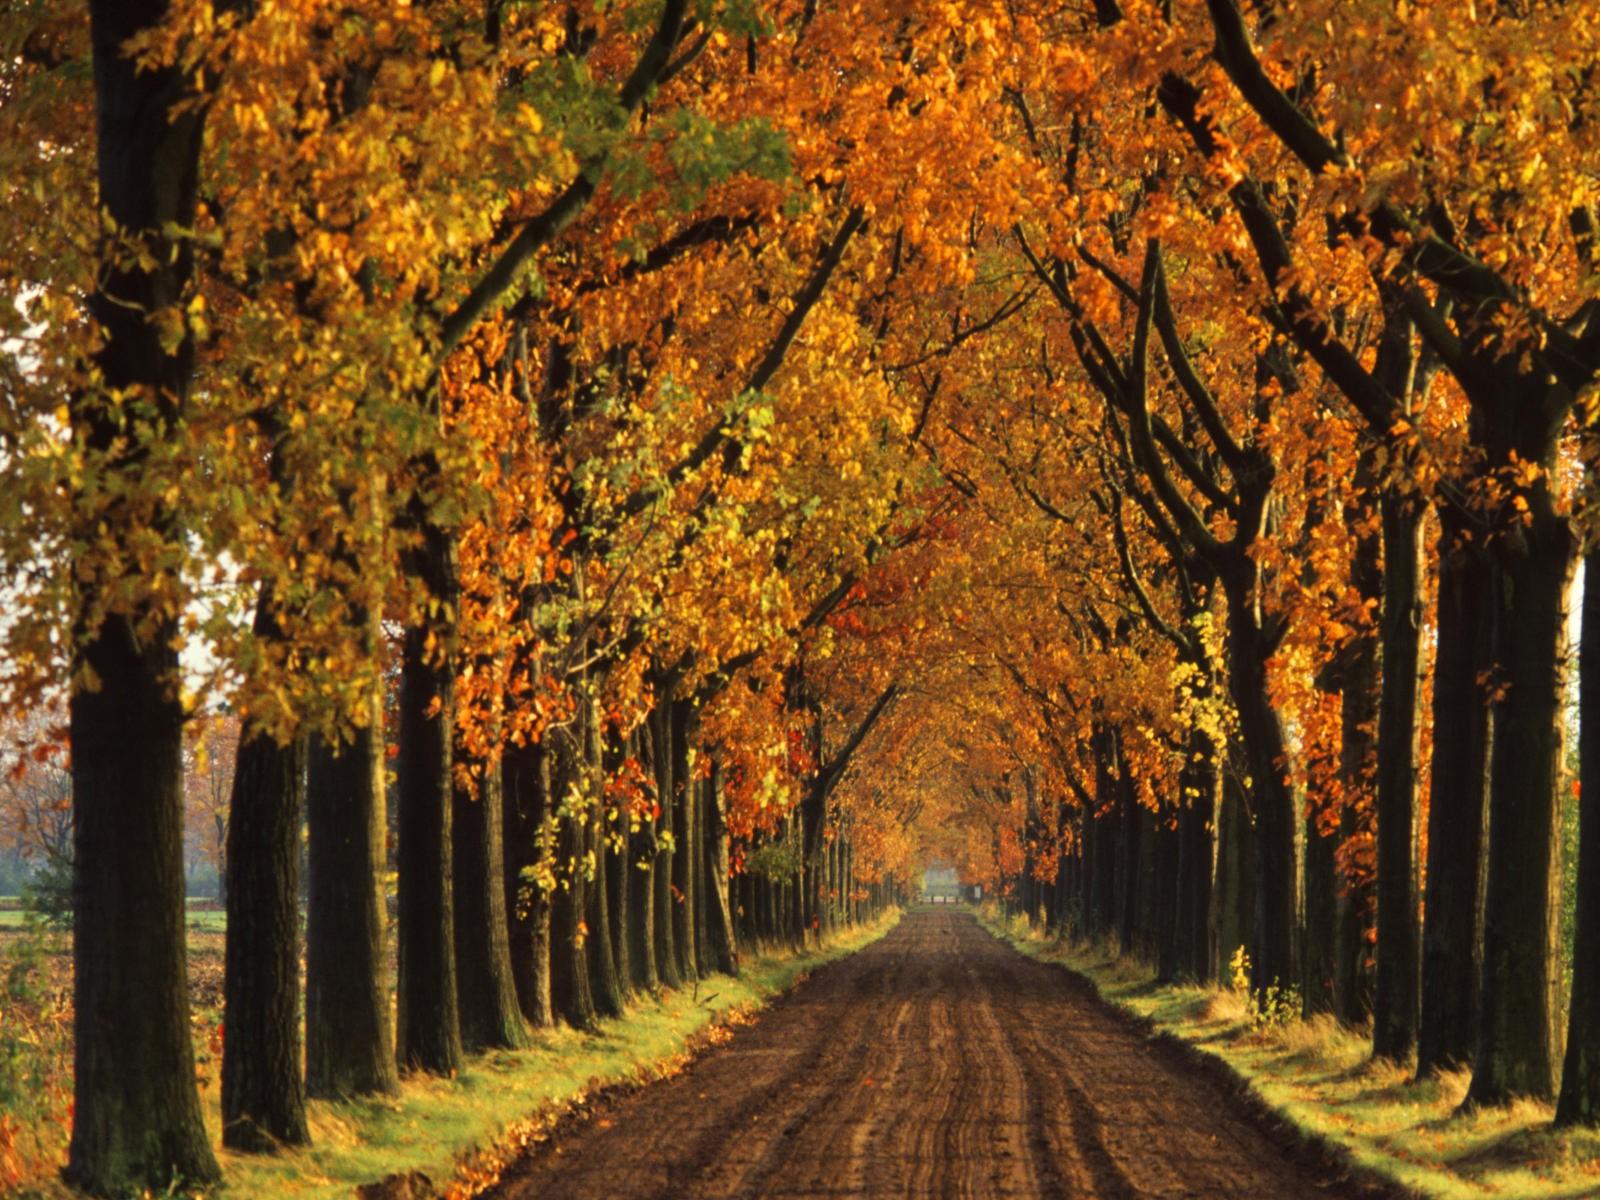 Autumn Desktop Wallpaper Related Keywords amp Suggestions 1600x1200